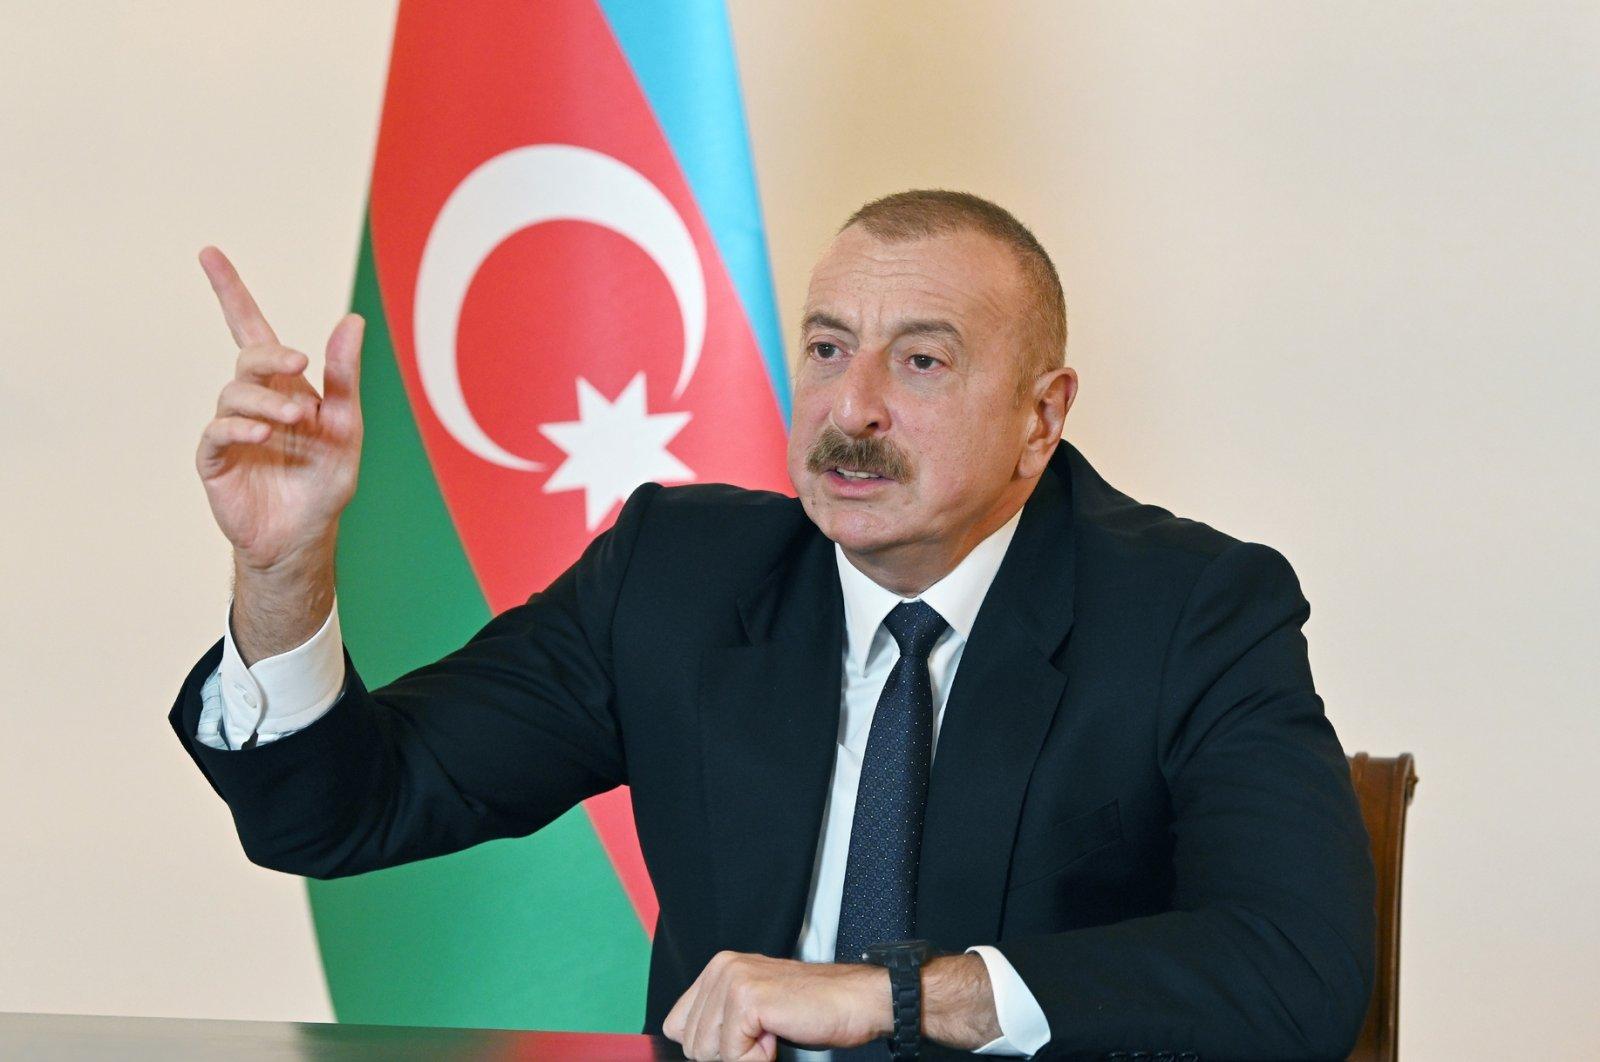 Azerbaijan's President Ilham Aliyev speaks during an address to the nation in Baku, Azerbaijan, Oct. 9, 2020. (REUTERS Photo)